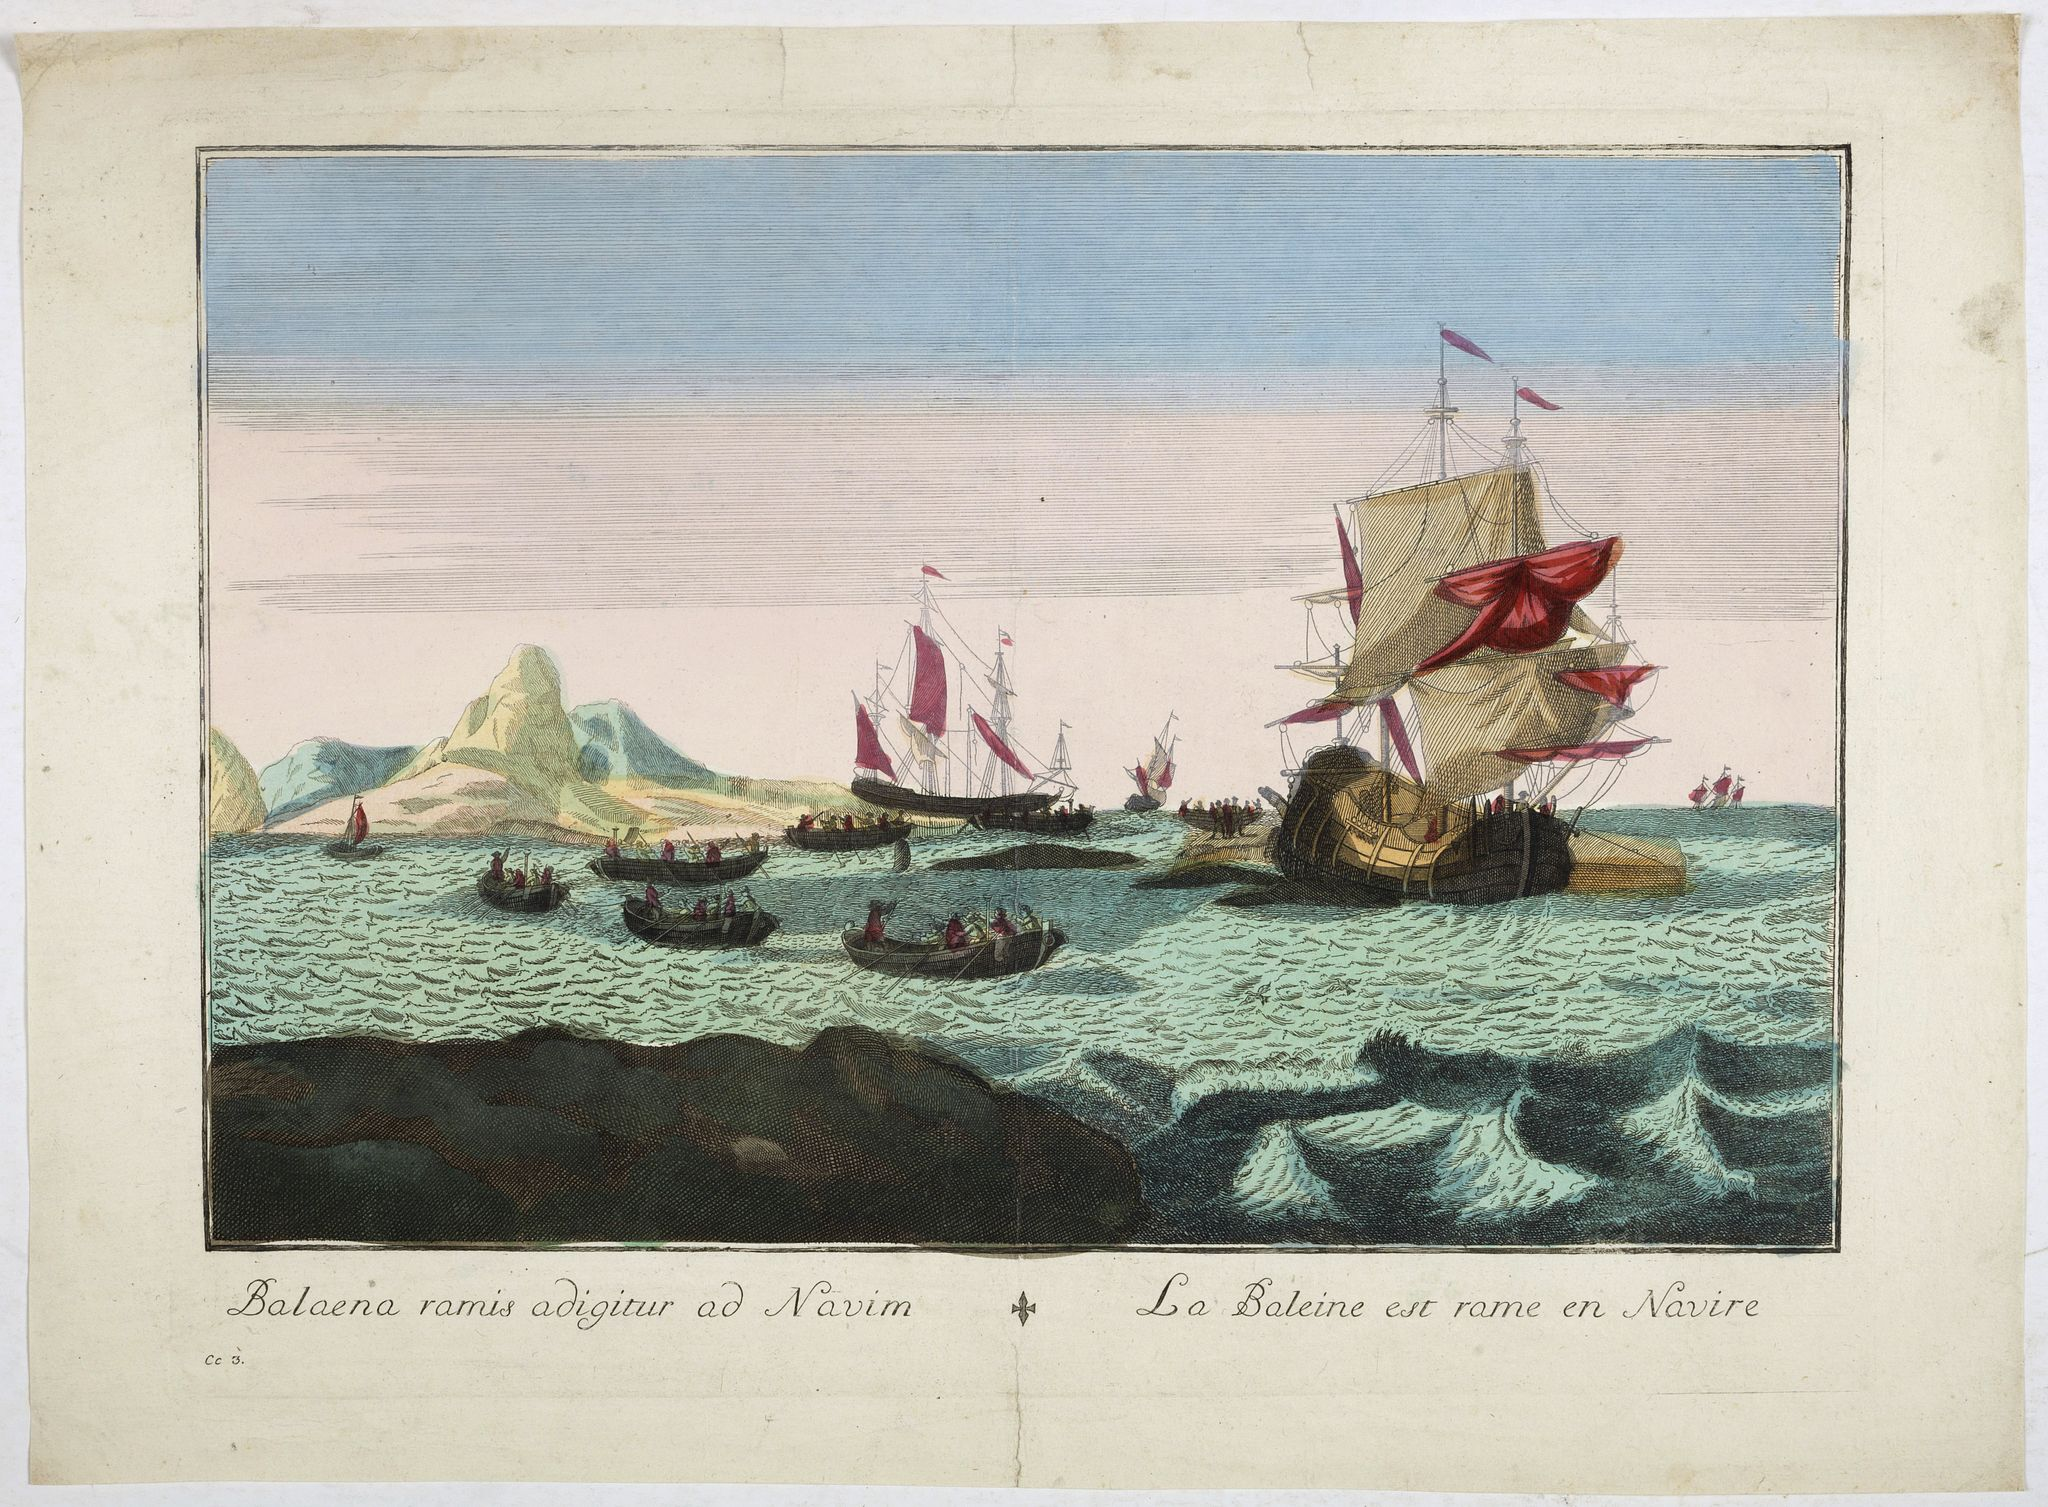 ANONYMOUS -  Balaena ramis adigitur ad Navim / La baleine est rame en Navire.